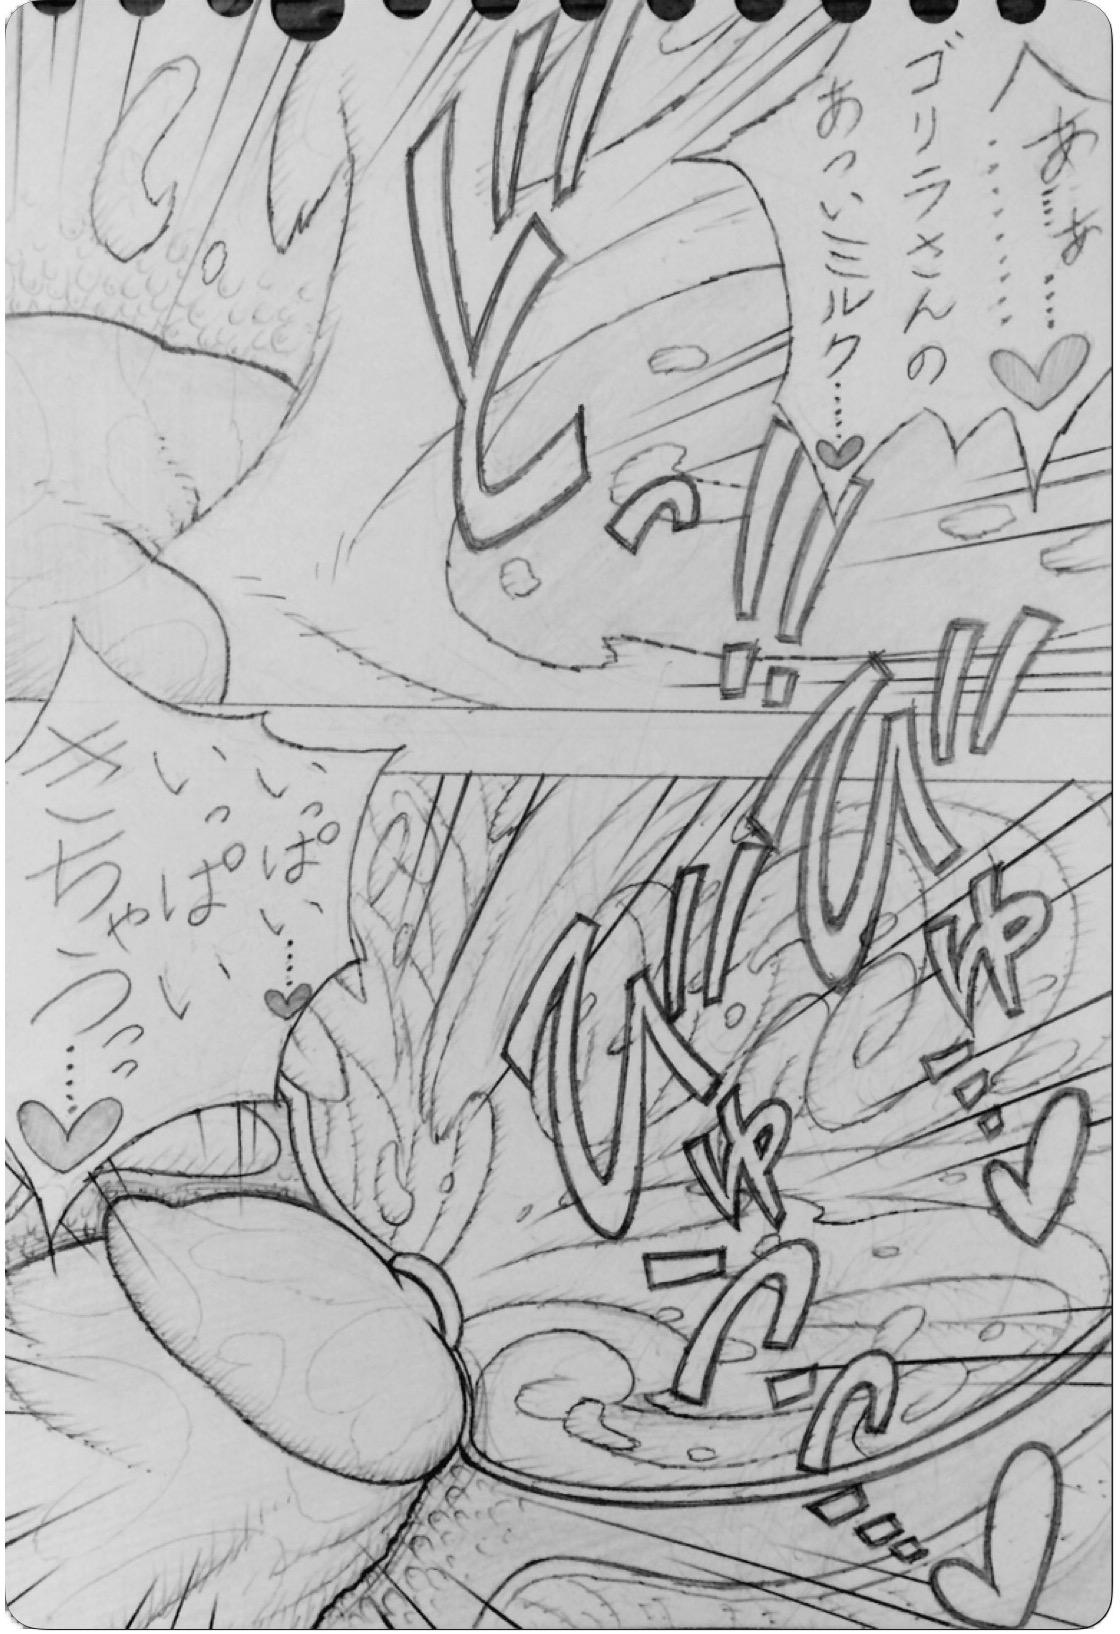 Gorilla-san and... 55